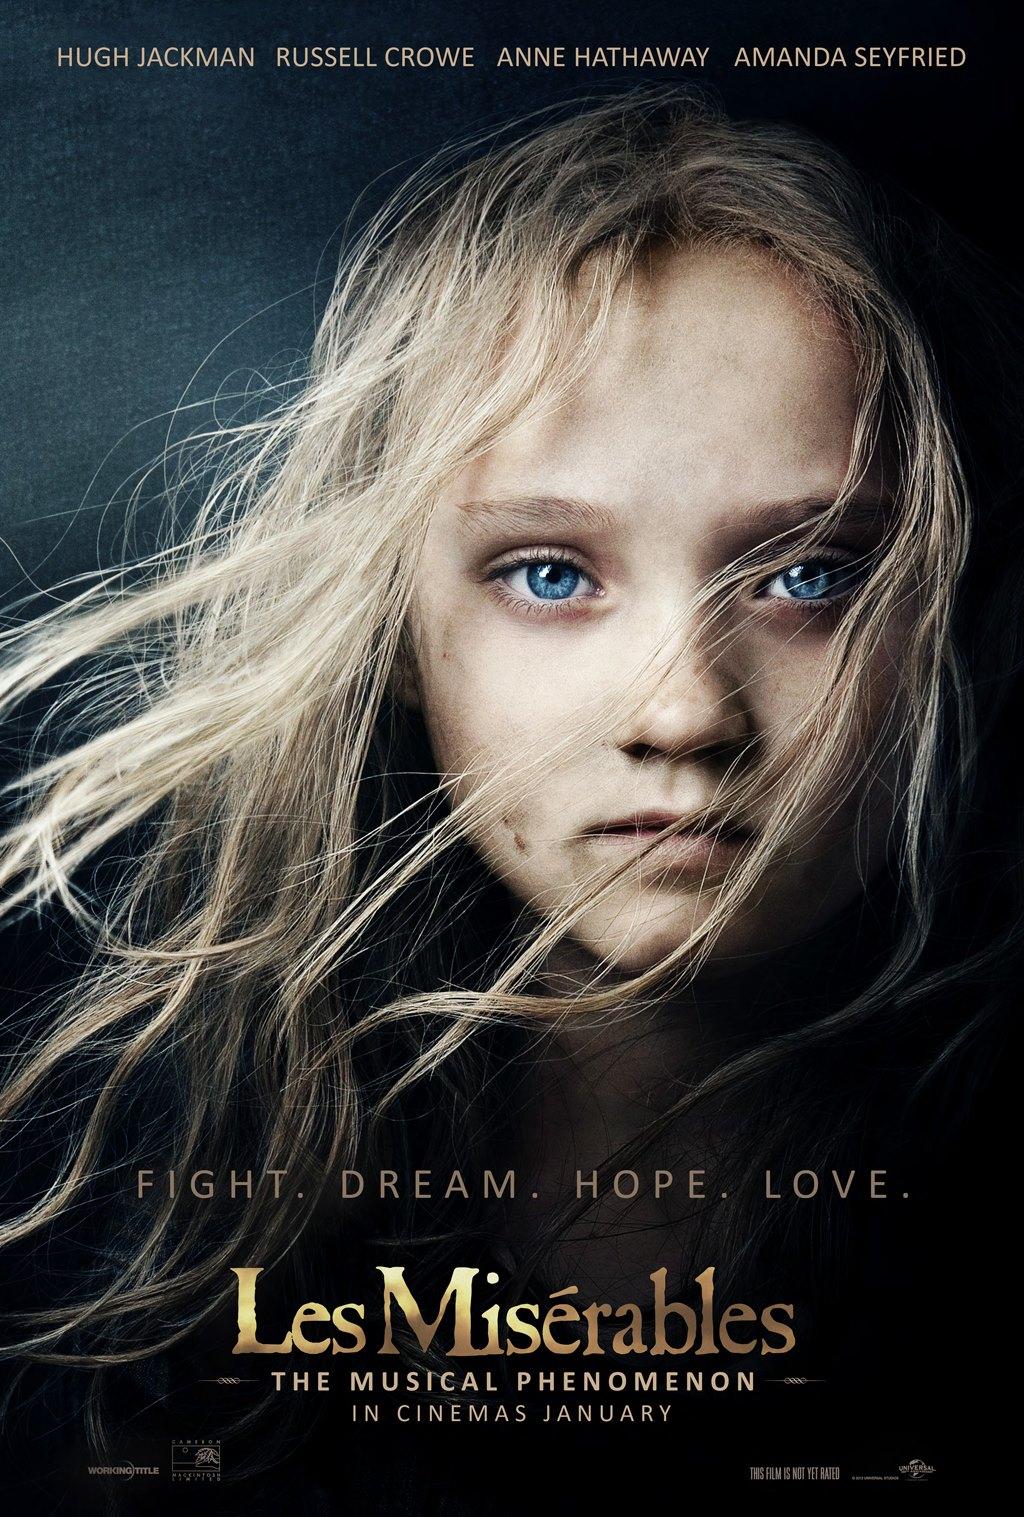 http://4.bp.blogspot.com/-gLOkc1xI8Mo/UOZxnkry-eI/AAAAAAAABrA/9LPjgjVpUs8/s1600/les-miserables-film-2012-poster.jpg